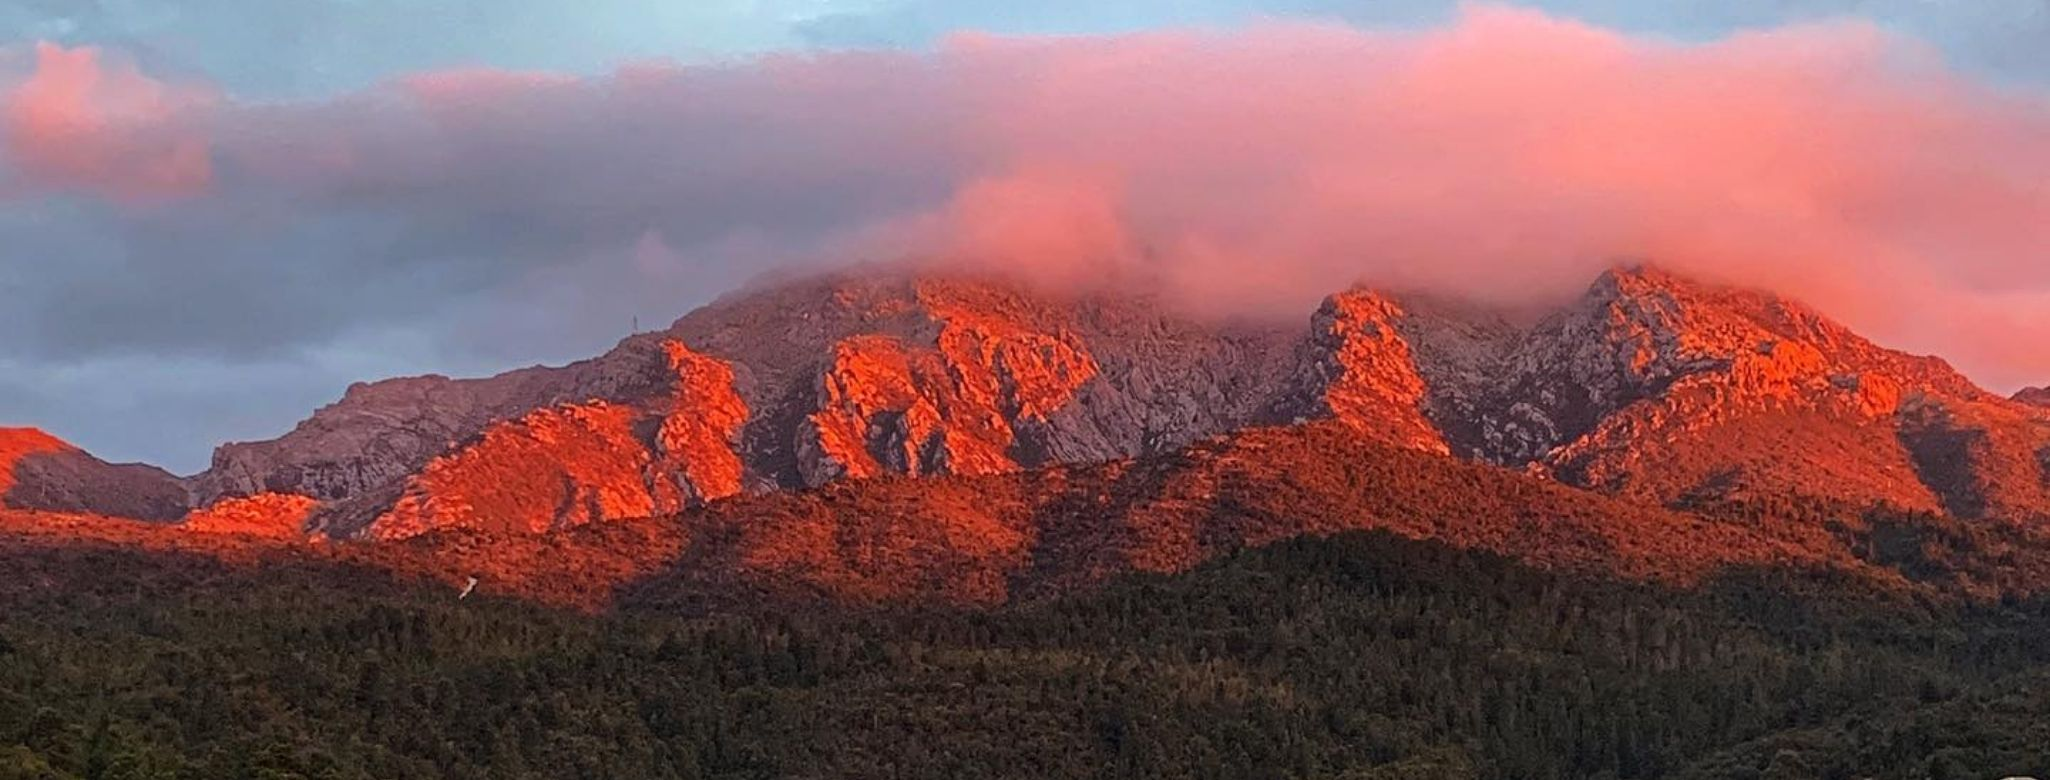 Penghana Boasts Uninterrupted Views Of Mount Owen, Which Sits Over Queenstown In Tasmania's Western Wilderness